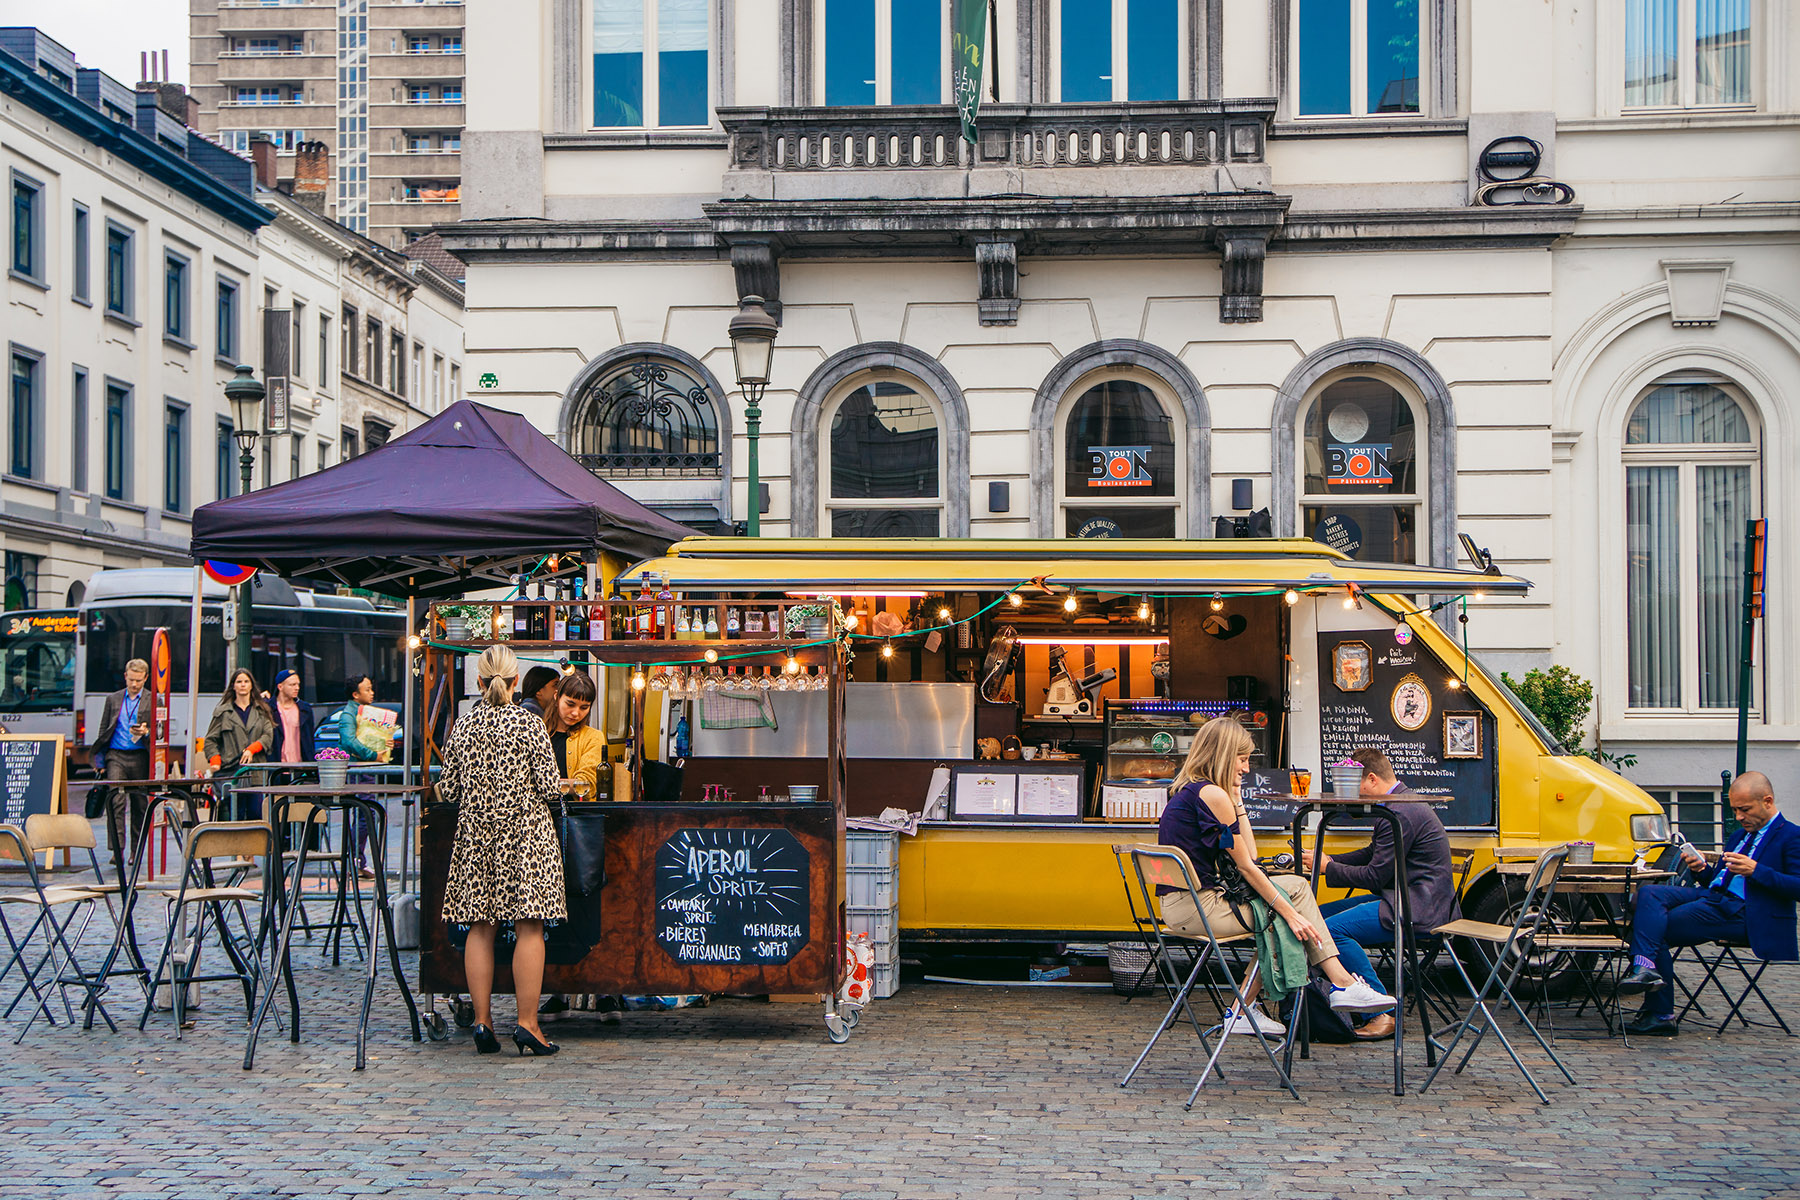 Food truck in Brussels